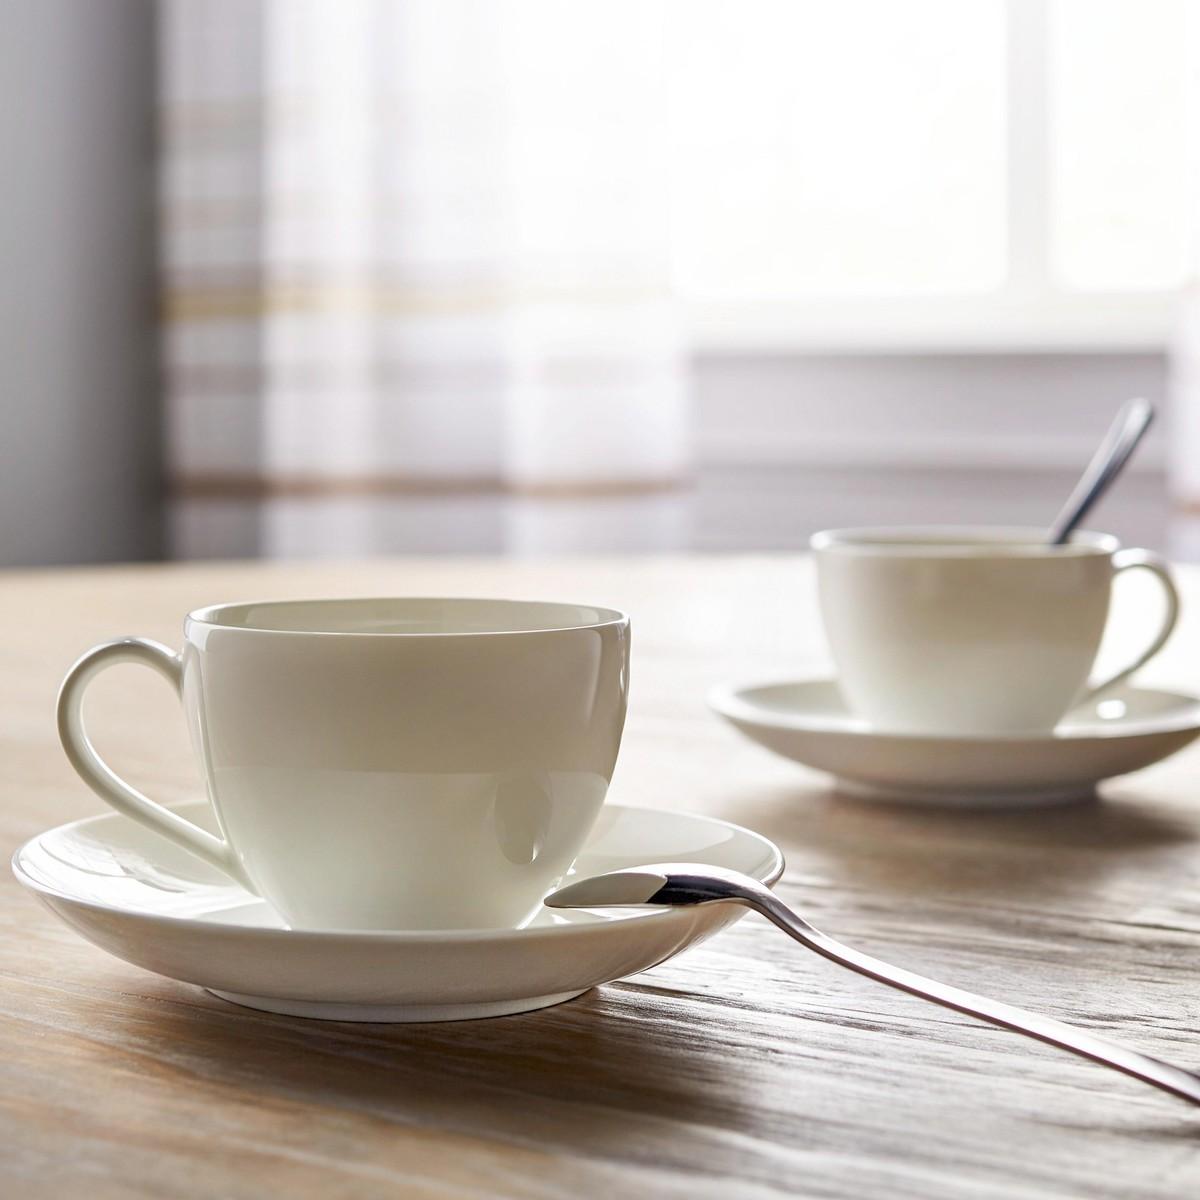 Bild 1 von Kaffeeset Vivo Hot Basics 4-tlg